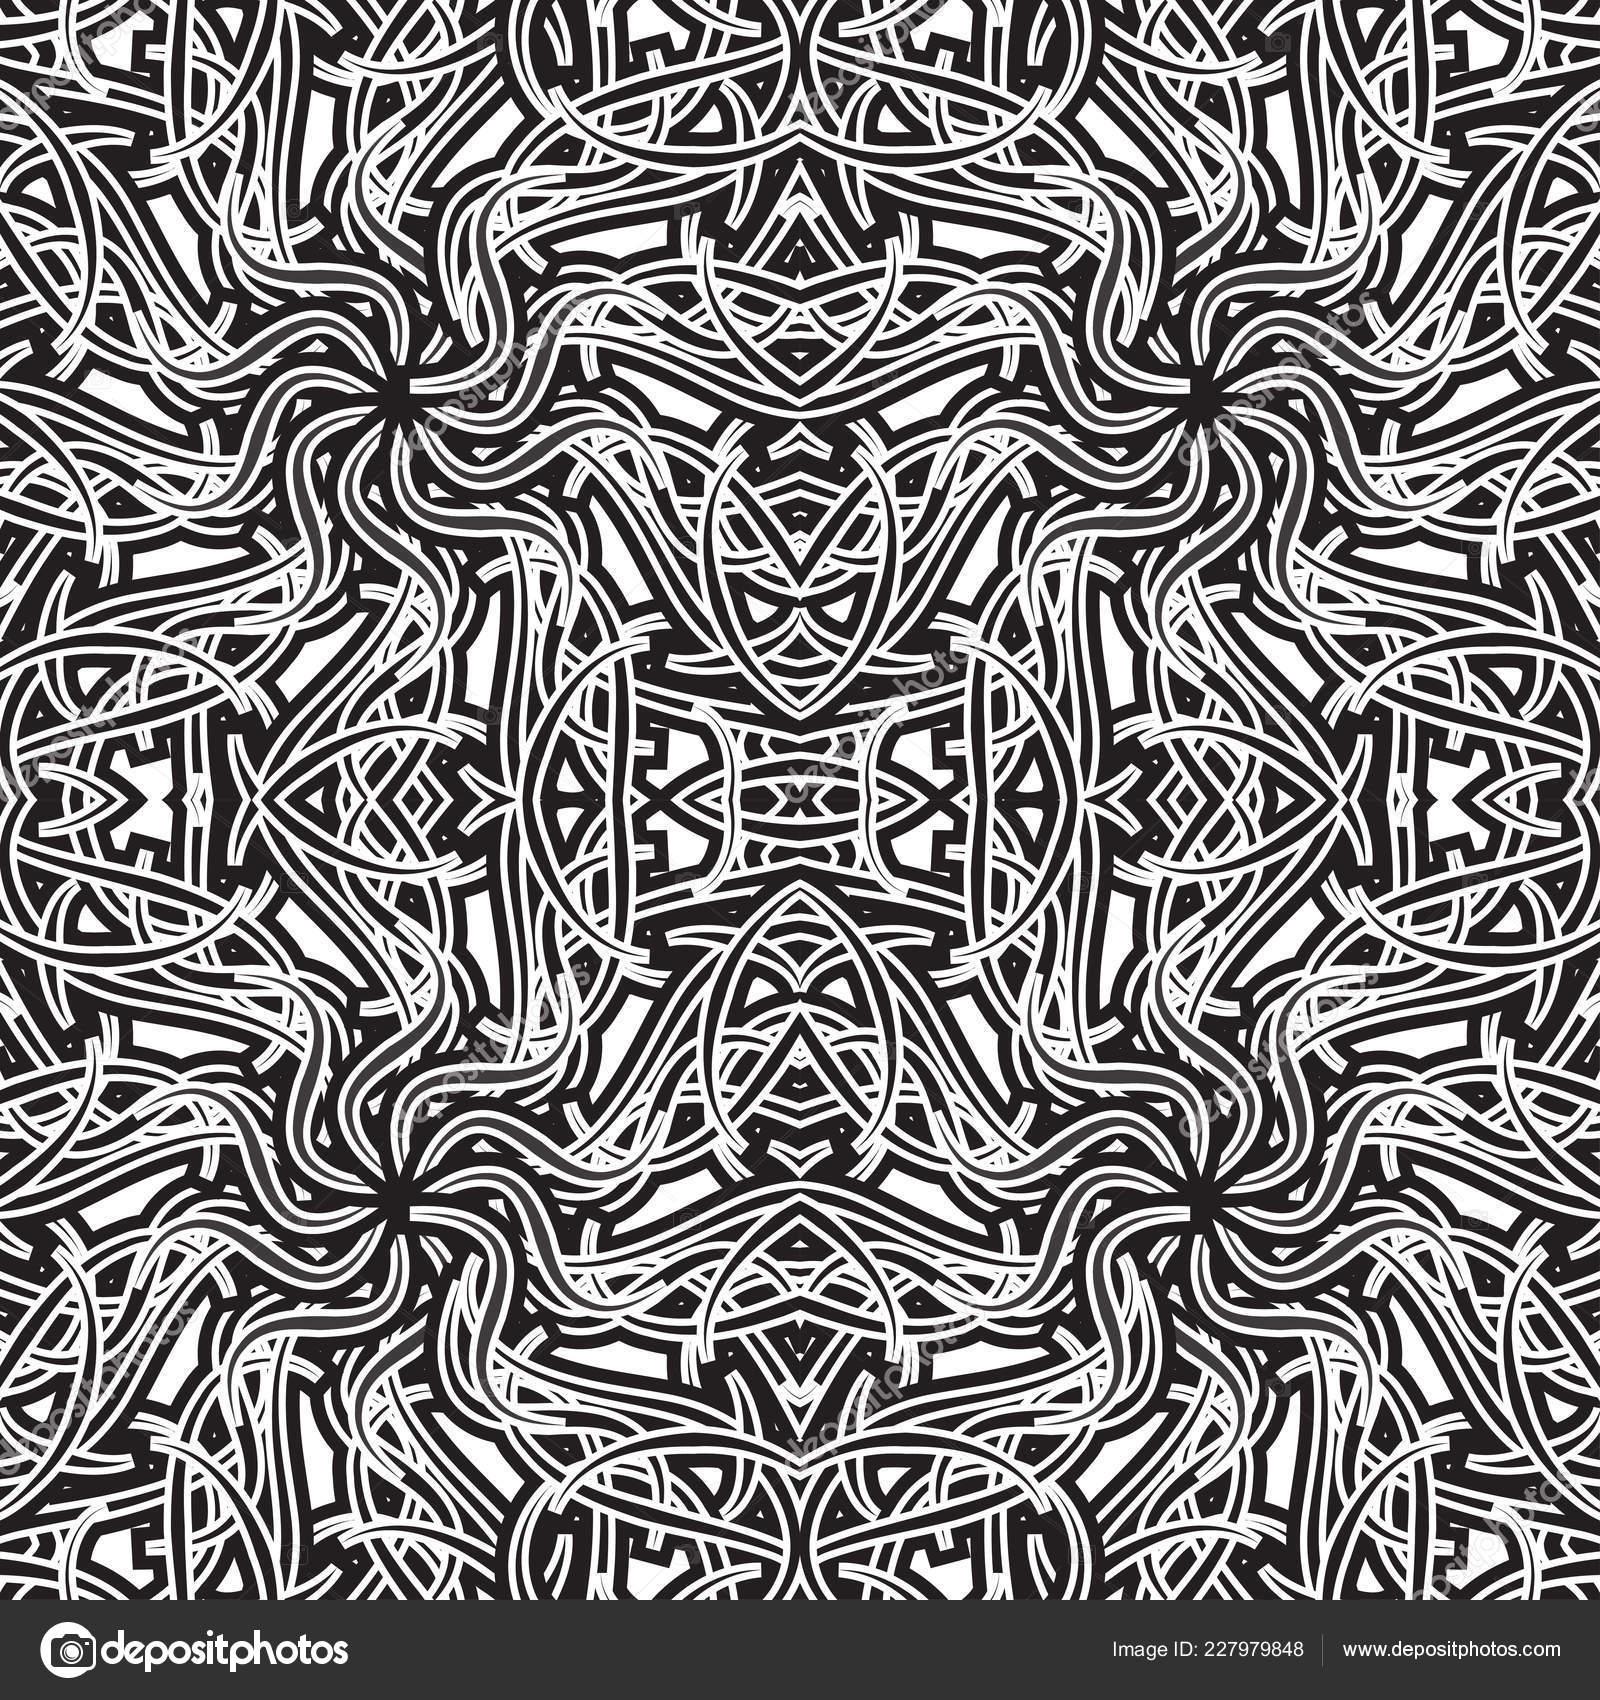 Nahtlose Muster Abstrakt Schwarz Weiss Muster Vektor